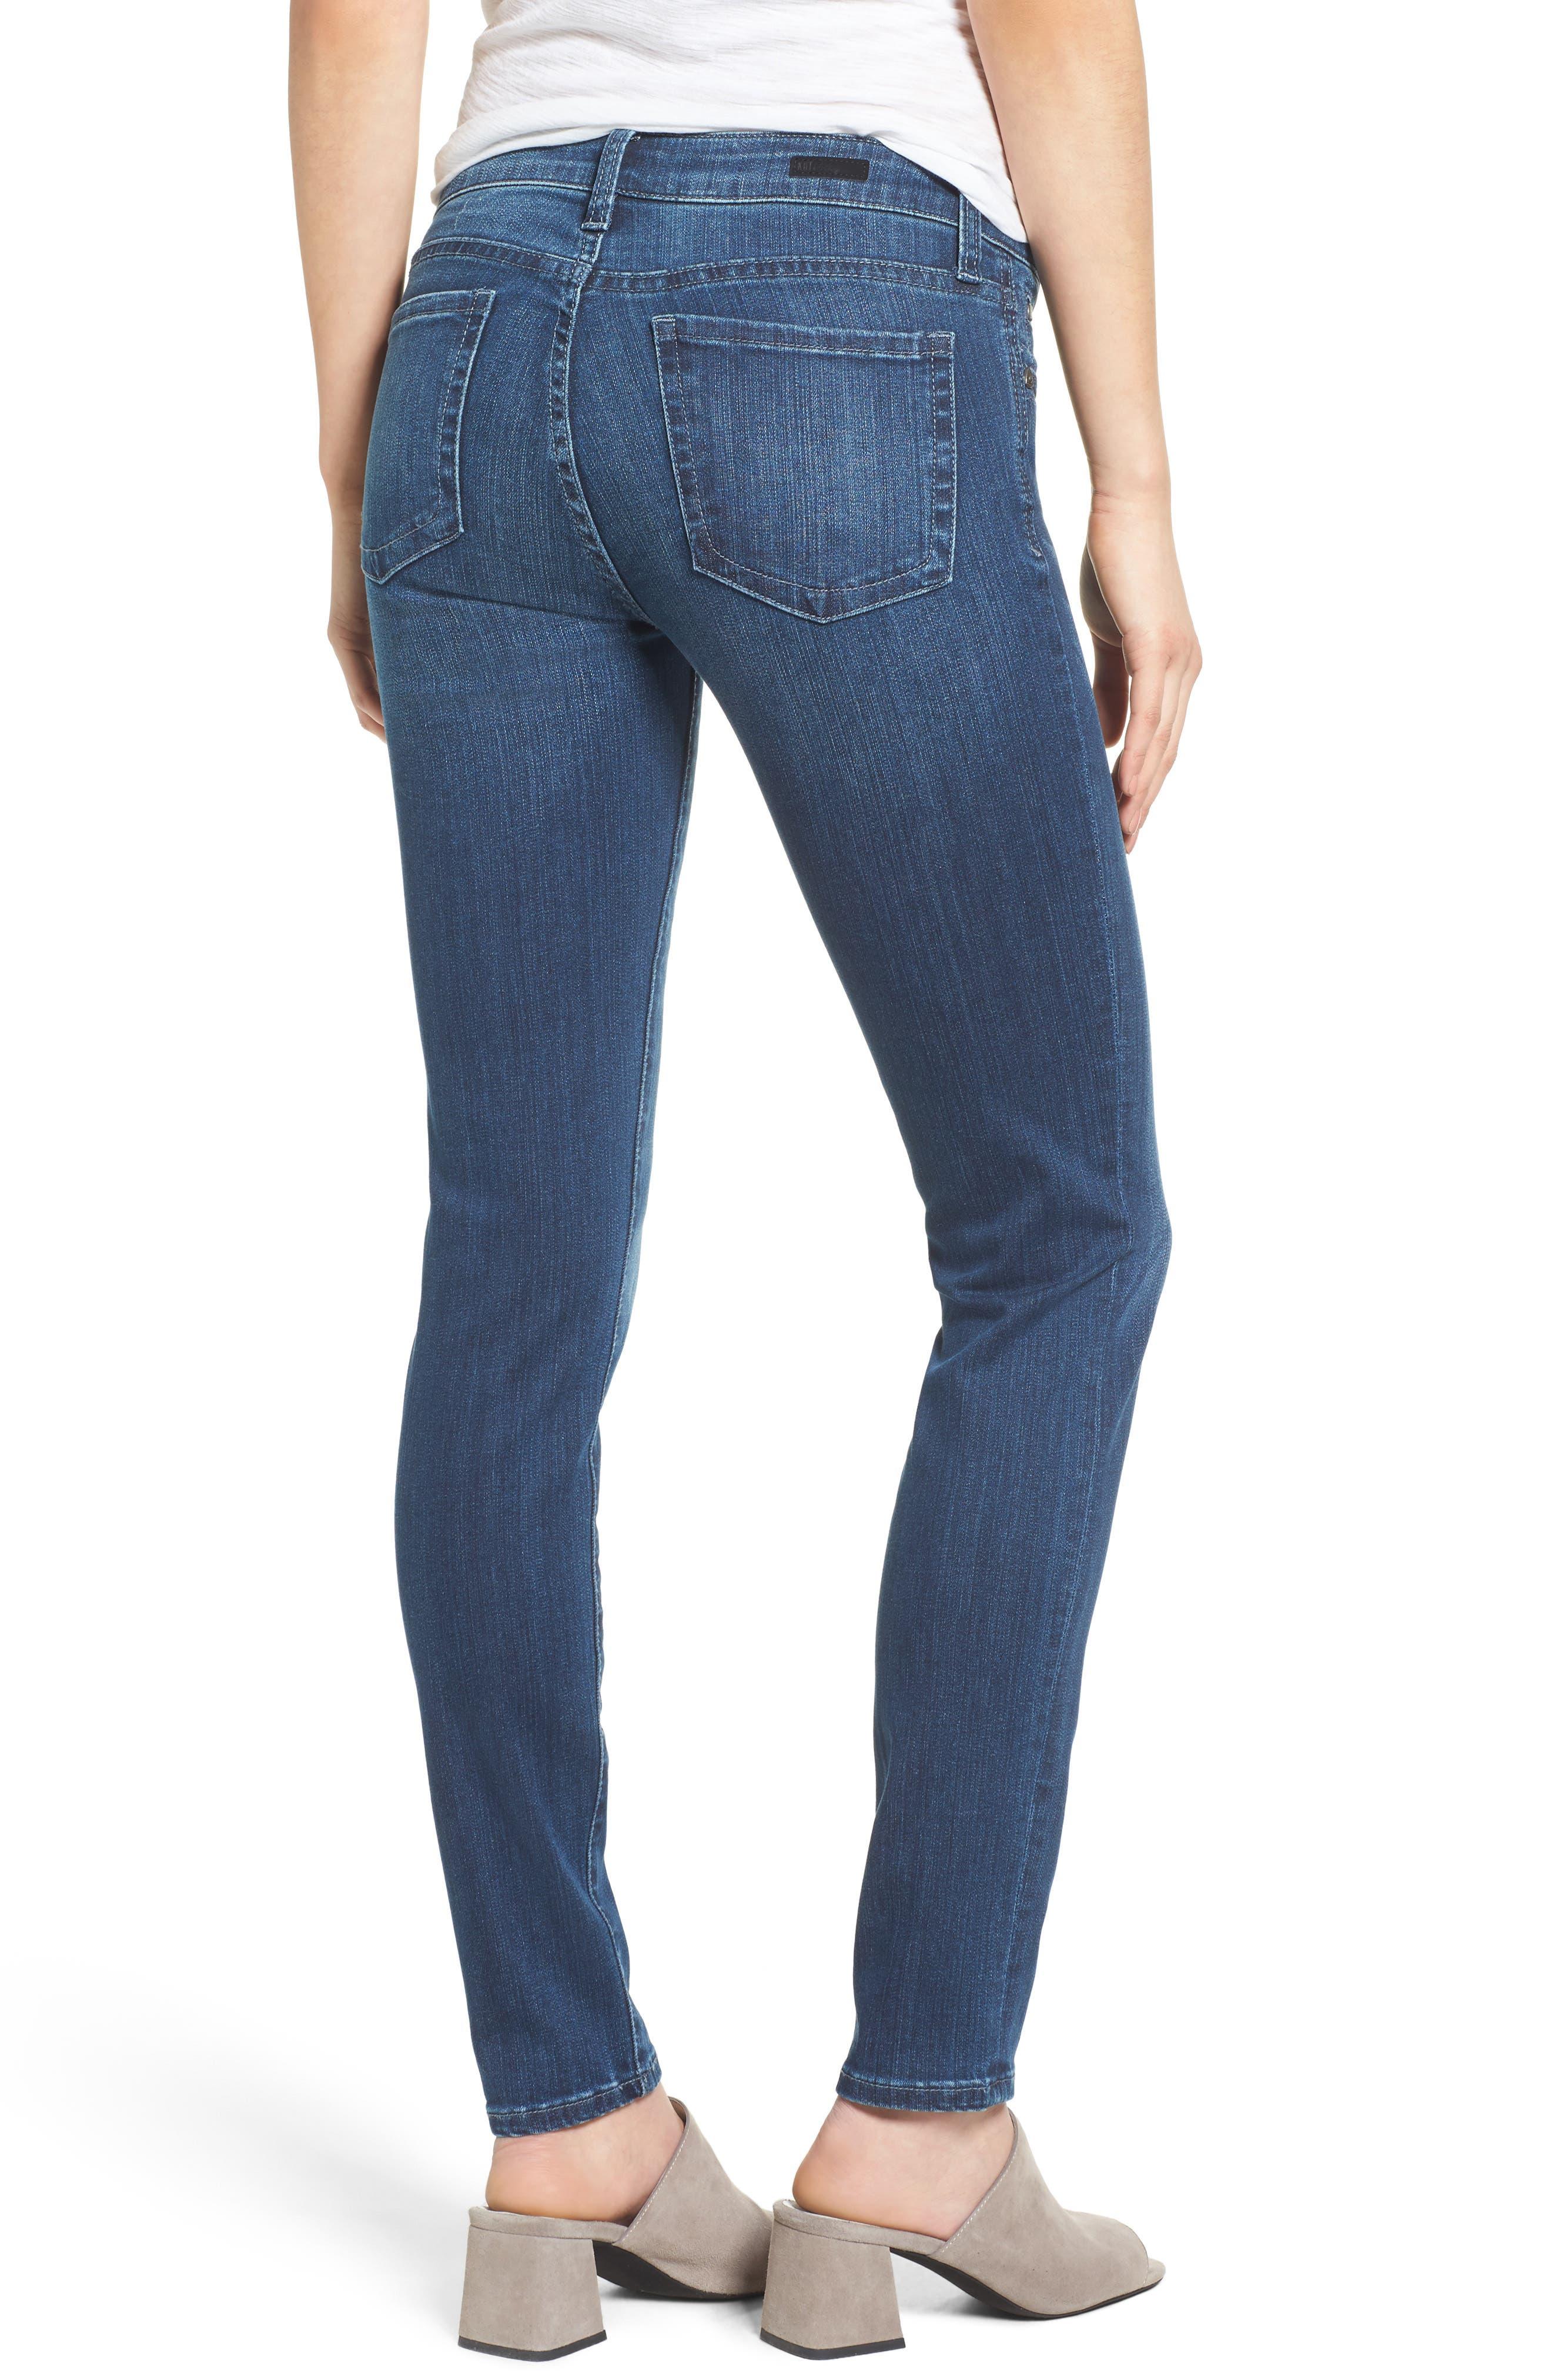 Alternate Image 2  - KUT from the Kloth Diana Stretch Skinny Jeans (Moderation) (Regular & Petite)